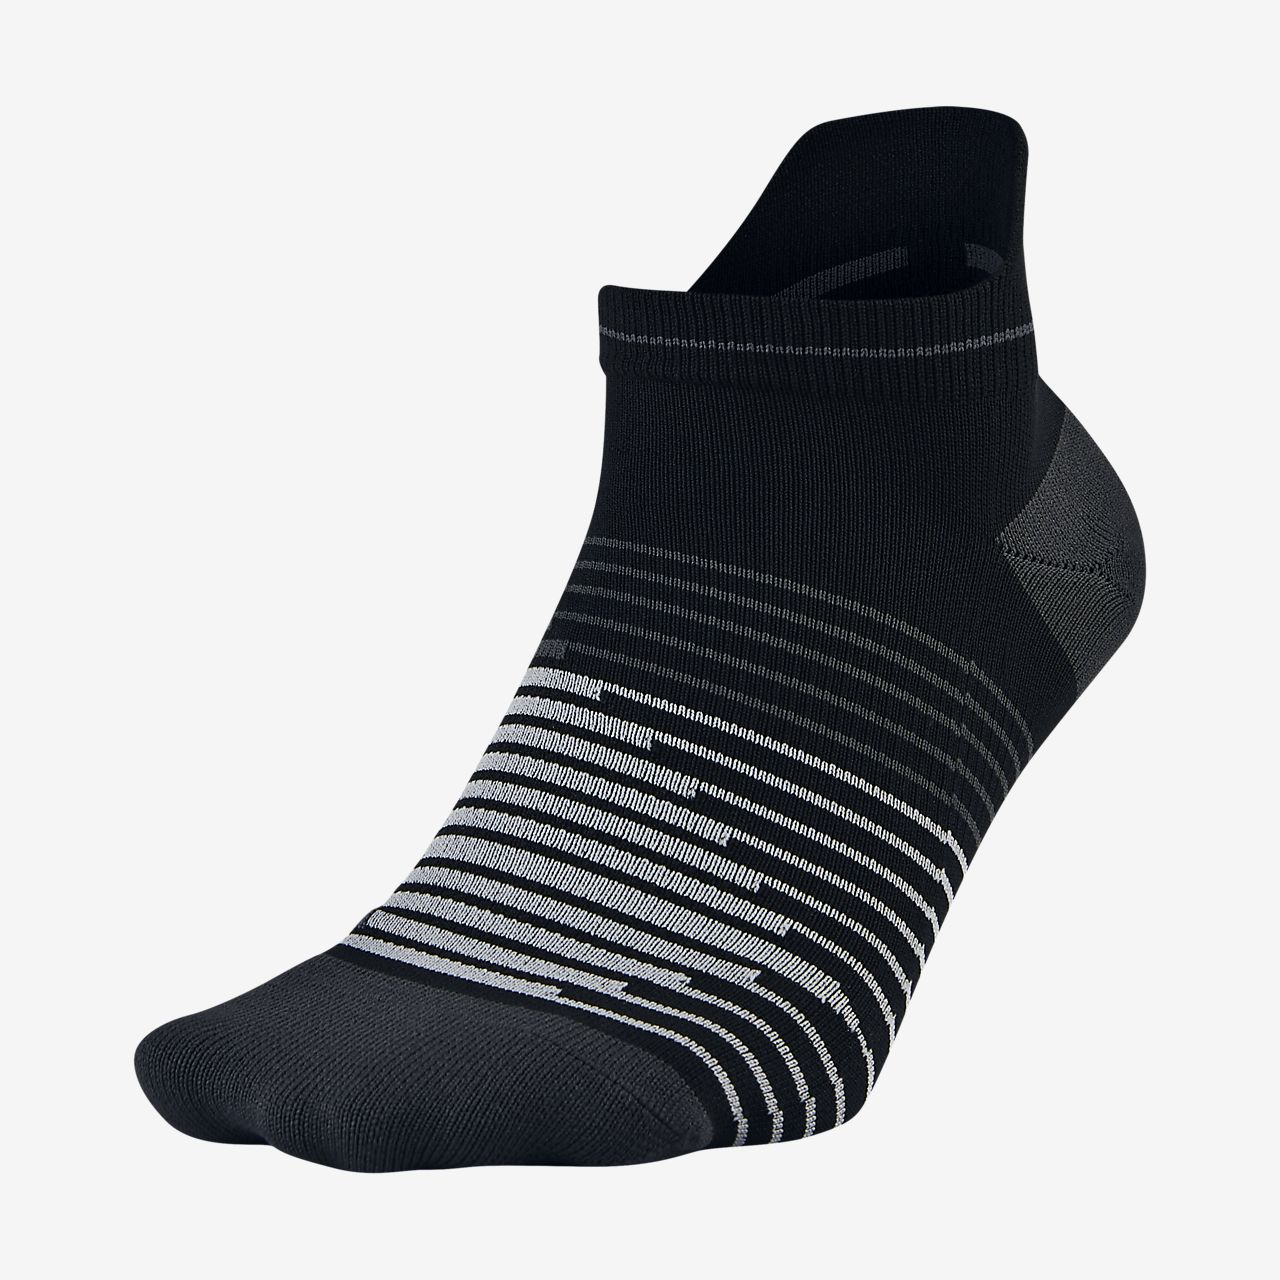 Nike Dri-FIT Lightweight No-Show Tab Hardloopsokken